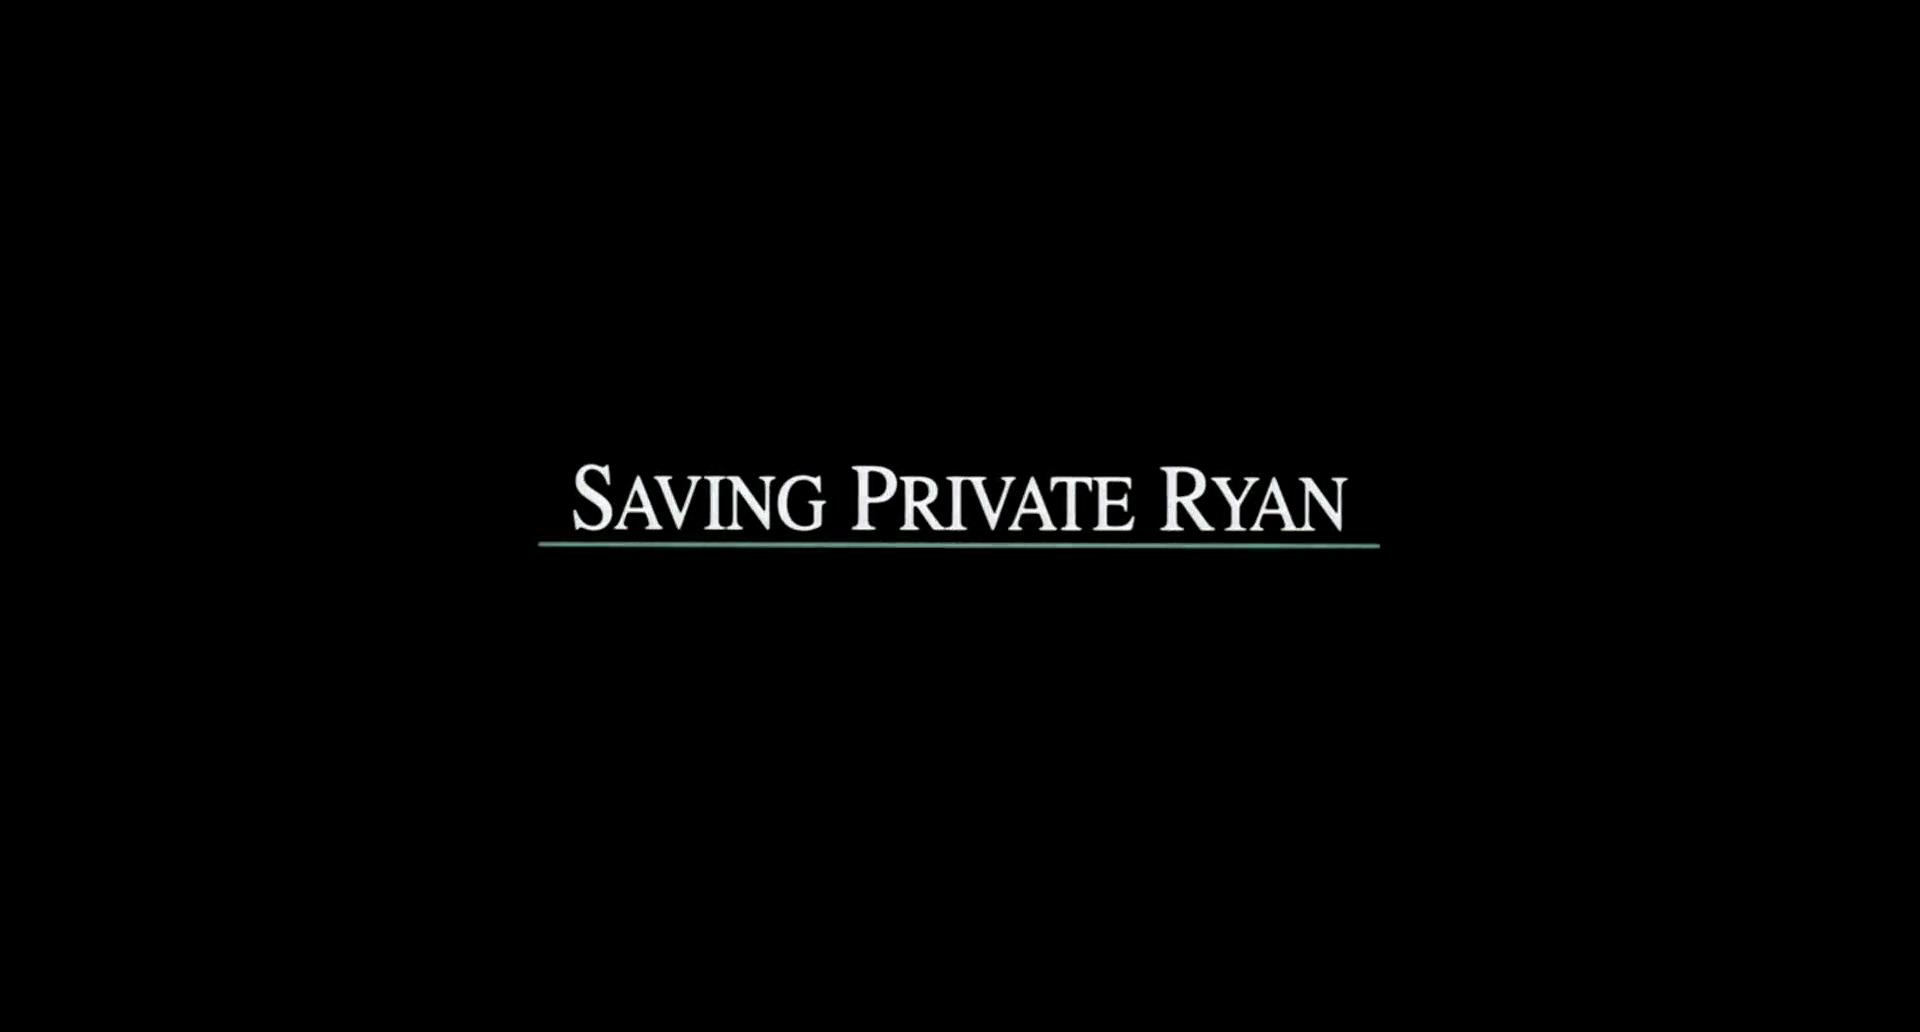 saving private ryan download 300mb